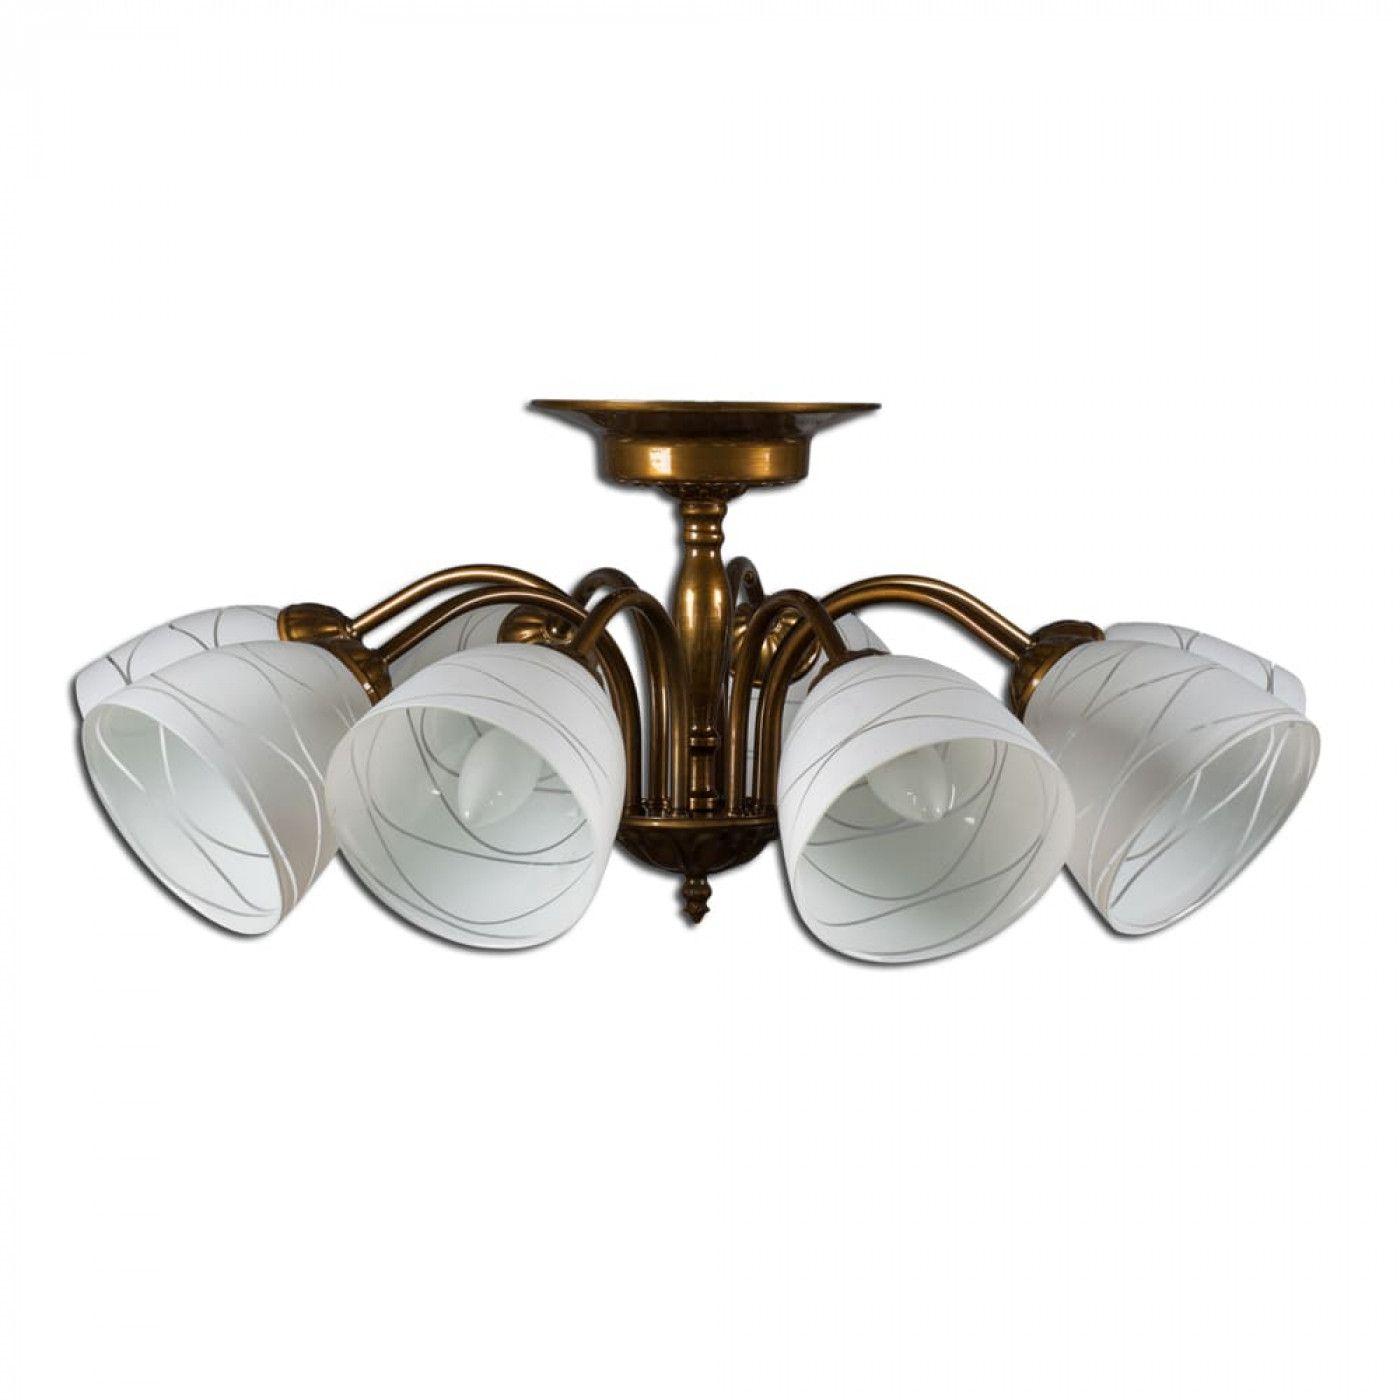 PETRASVET / Ceiling chandelier S2117-8, 8xE14 max. 60W